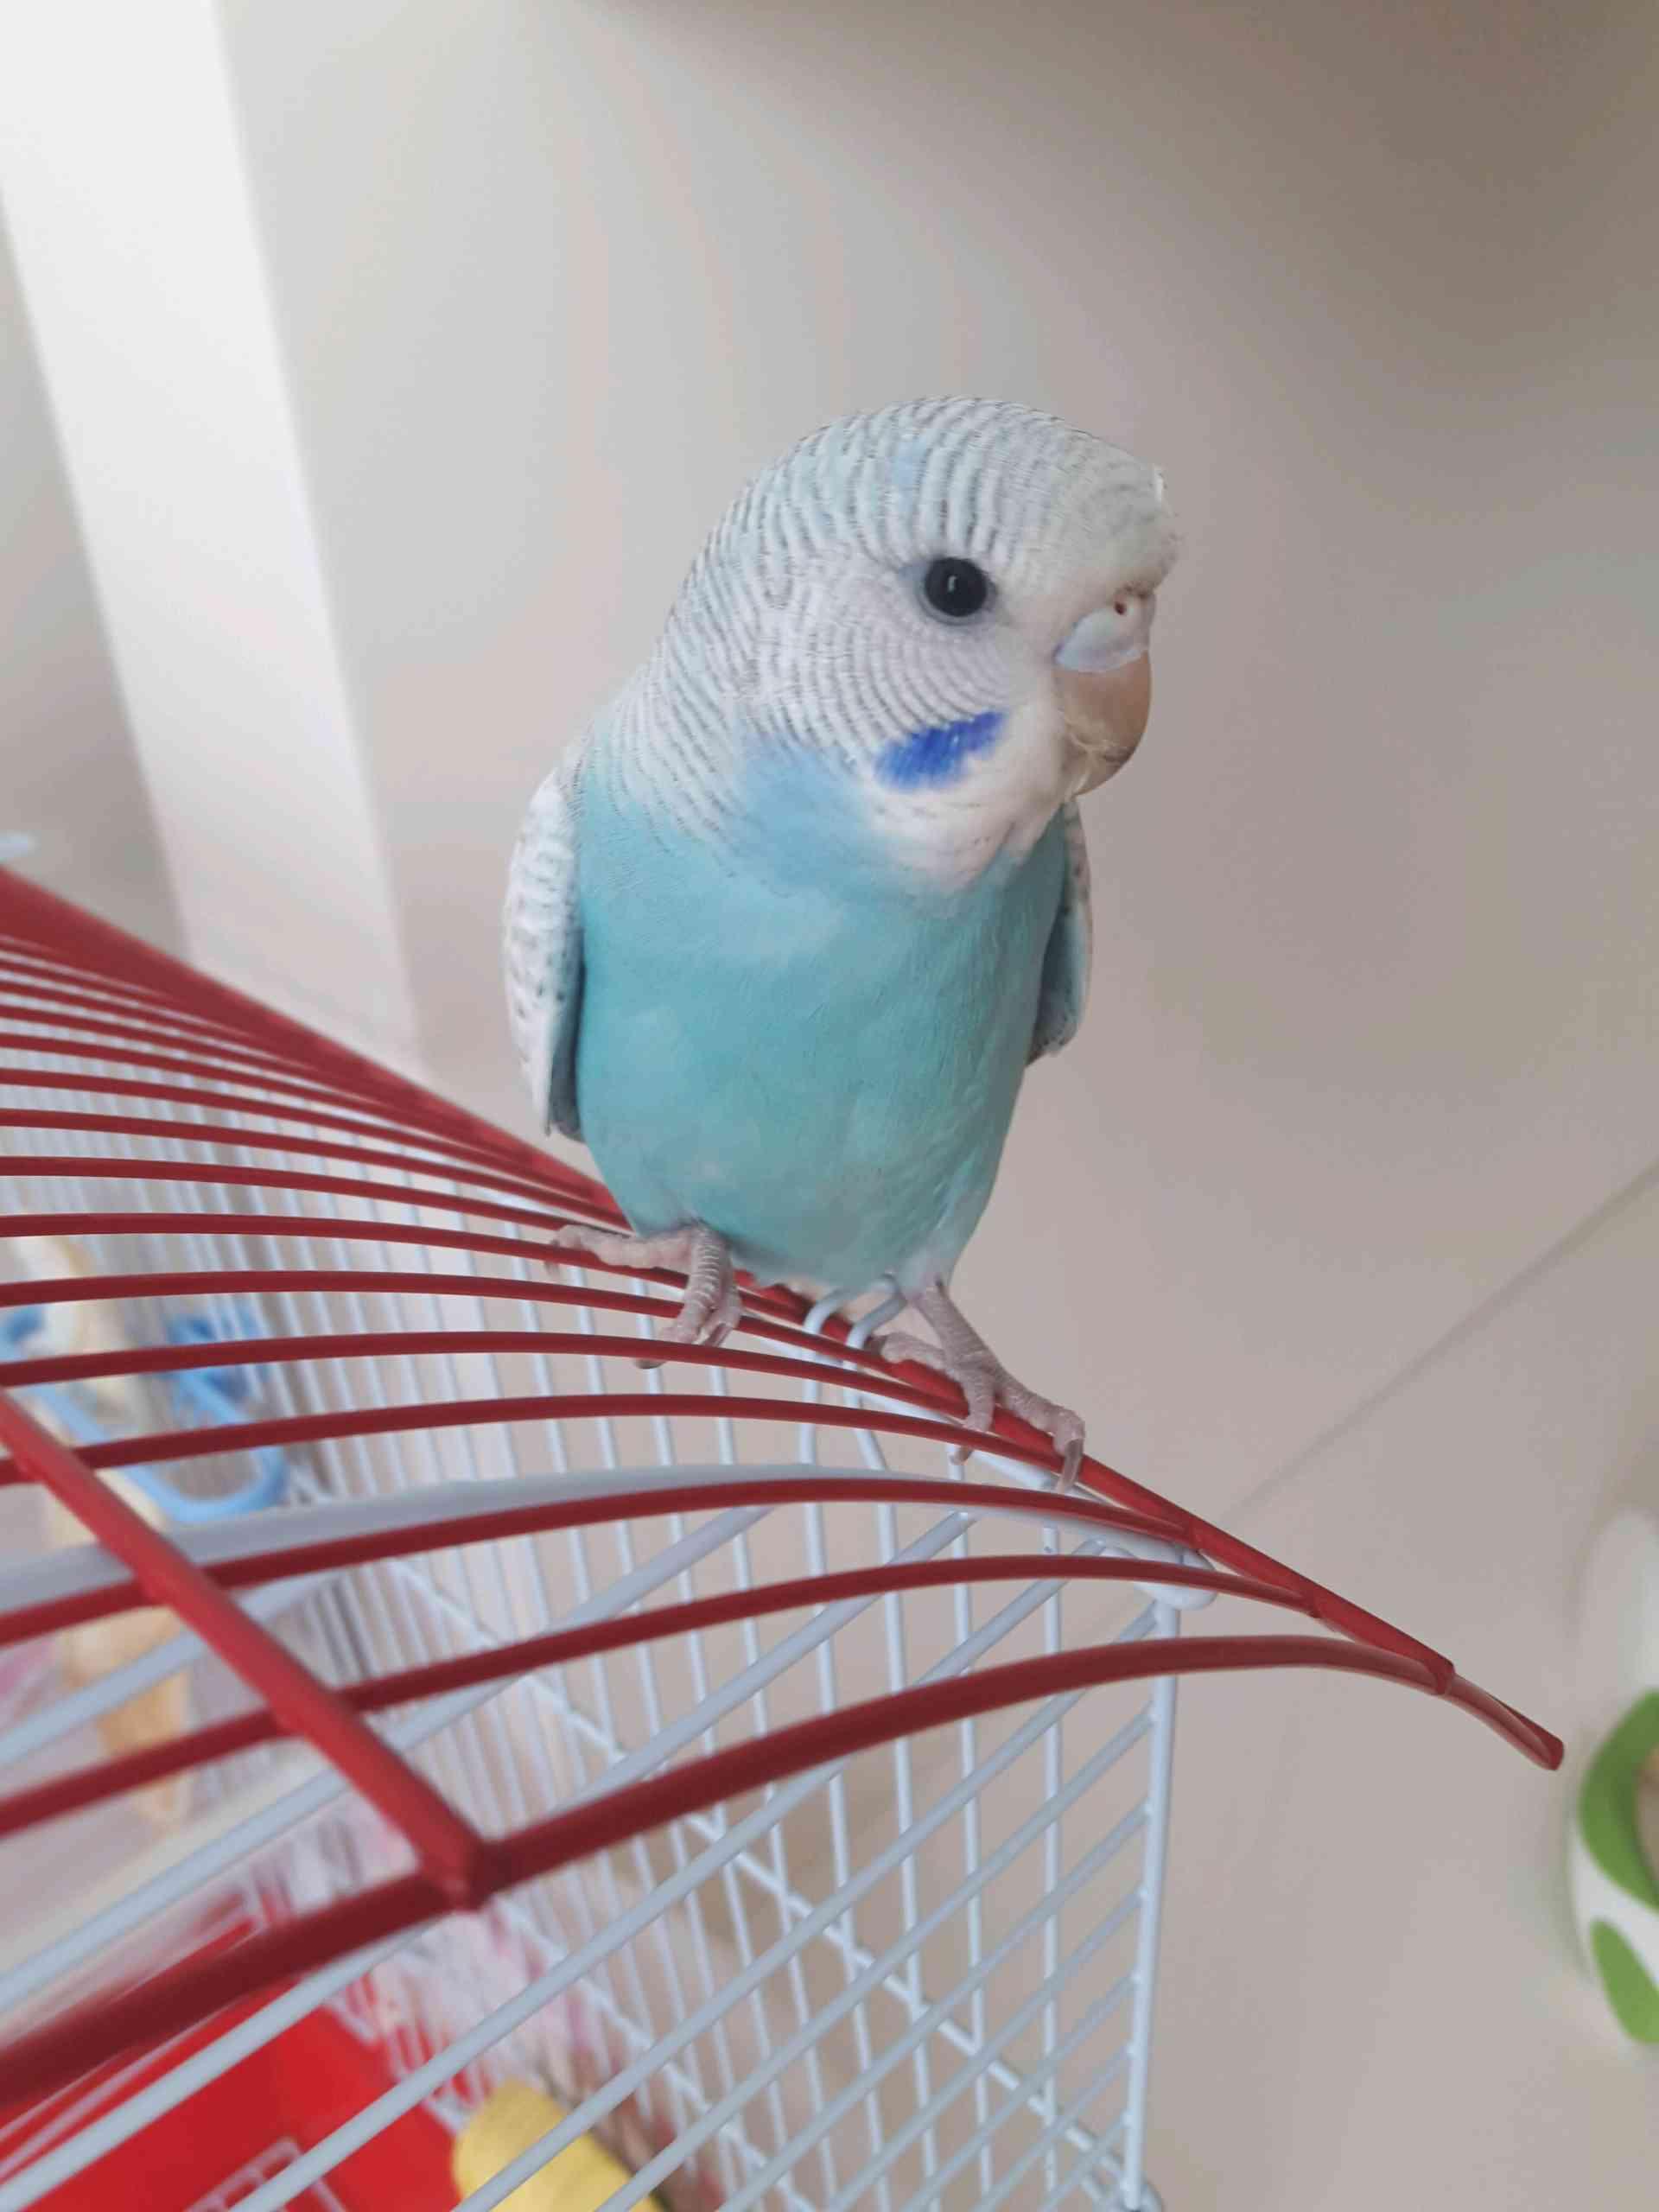 İstanbul Esenyurtta Muhabbet kuşum kayboldu